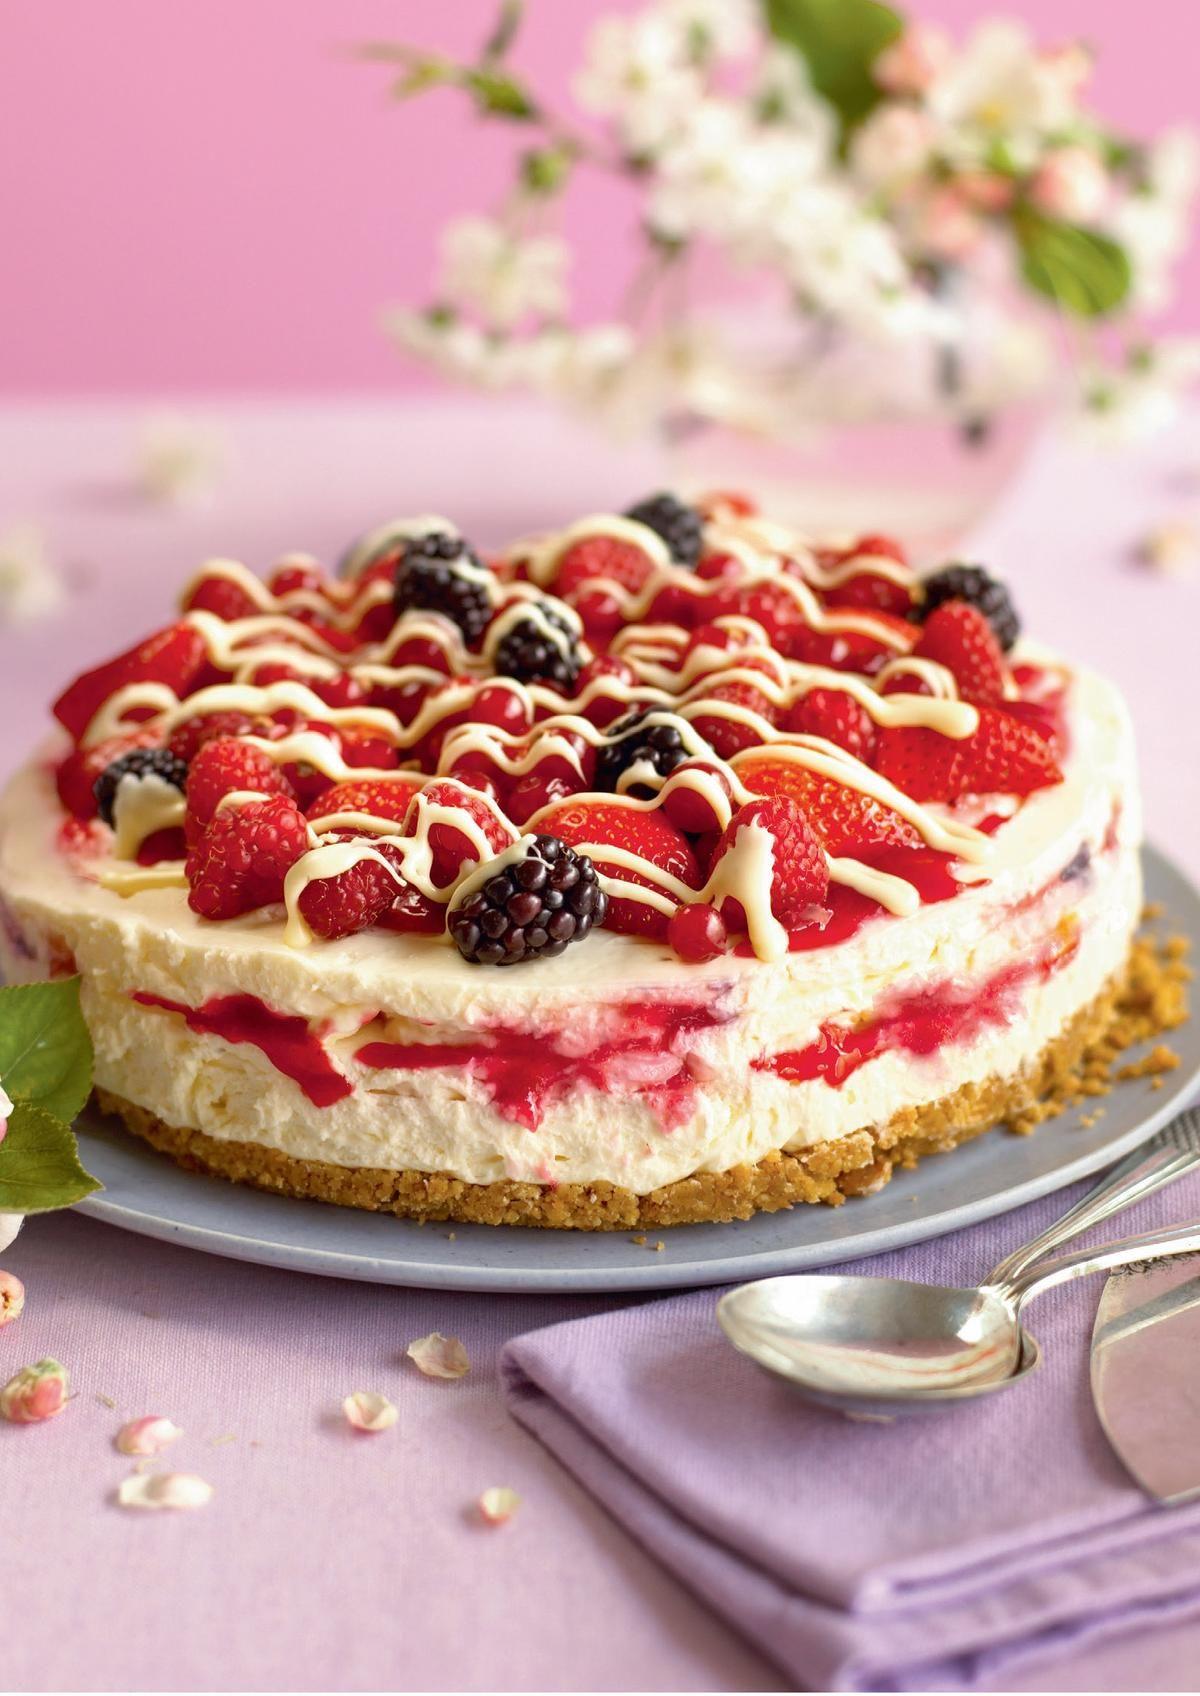 Raspberry Ripple Cheesecake - The Happy Foodie